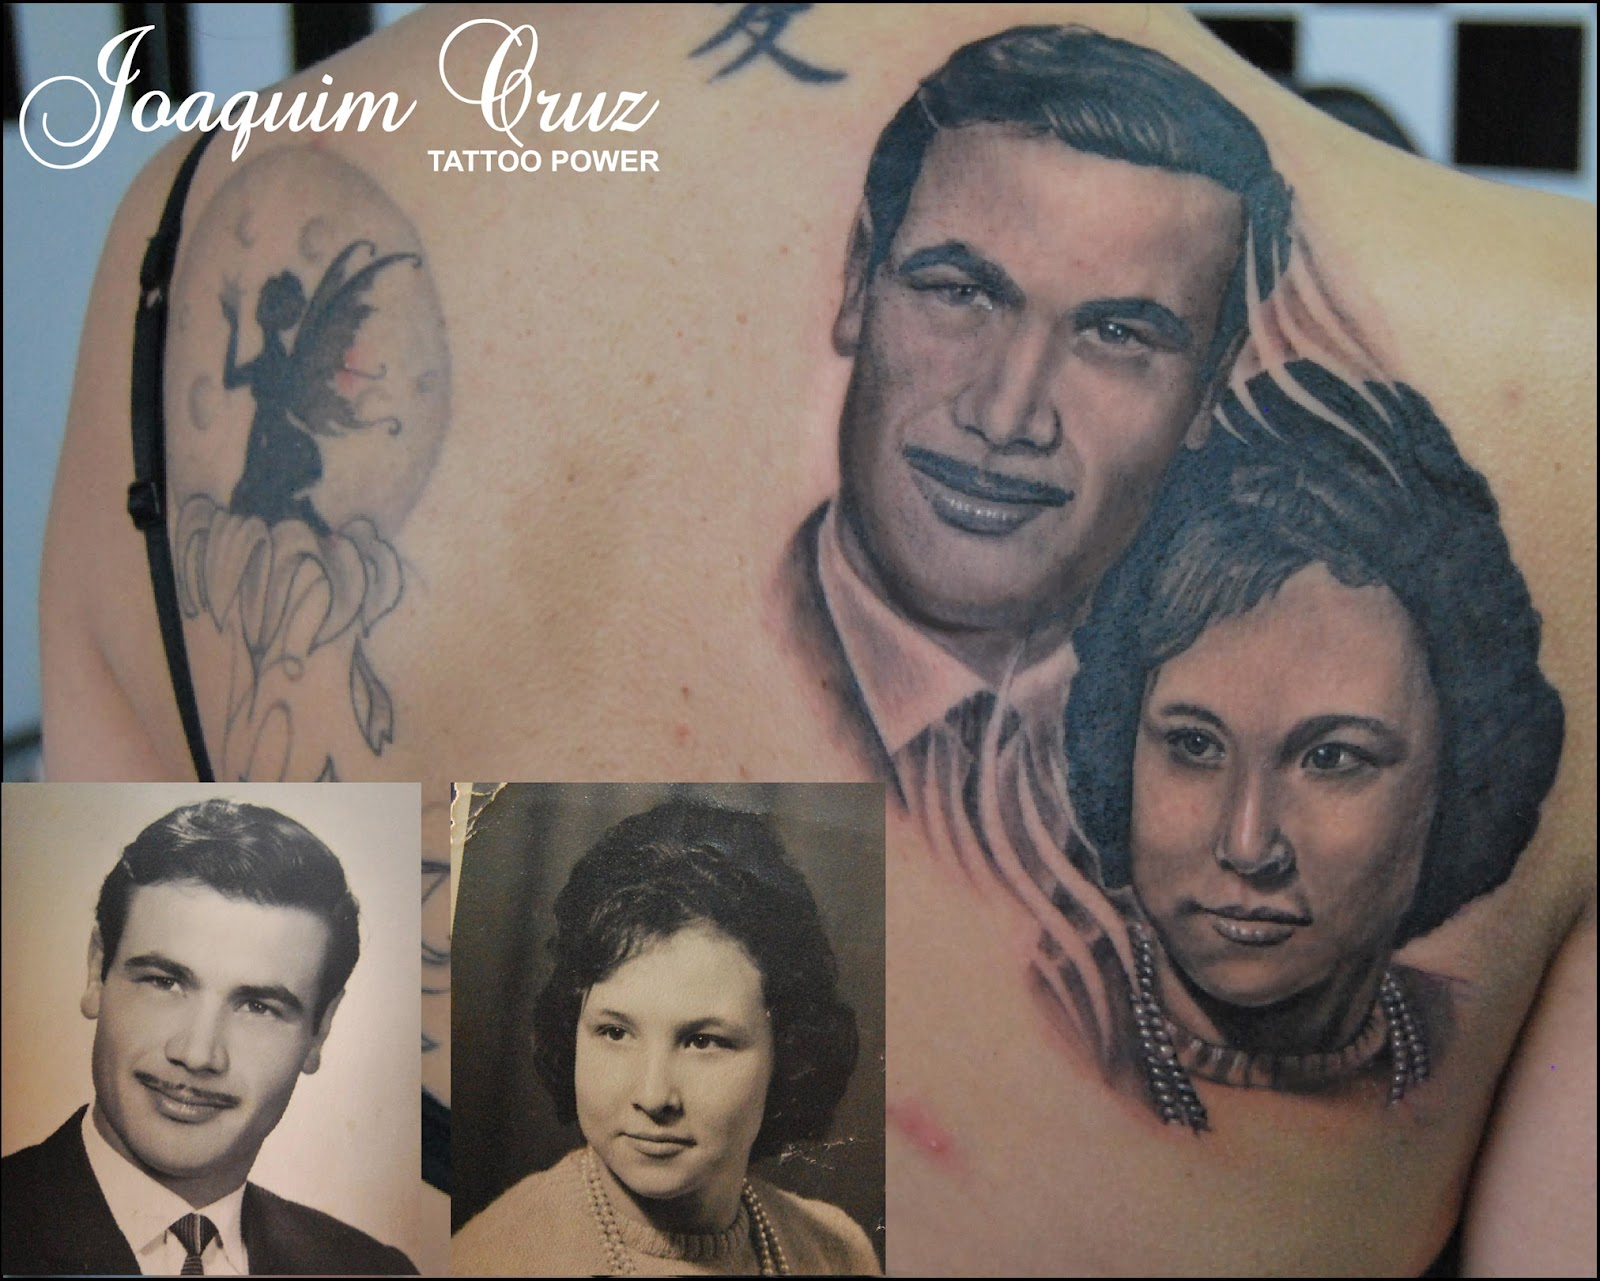 http://1.bp.blogspot.com/-aUNiIvBvNBY/T5kpGKoY68I/AAAAAAAAD-U/YlxSNxmLkOE/s1600/retratos+tattoo+power+lojas+de+tatuagens+porto+matosinhos+portugal+joaquim+cruz.jpg